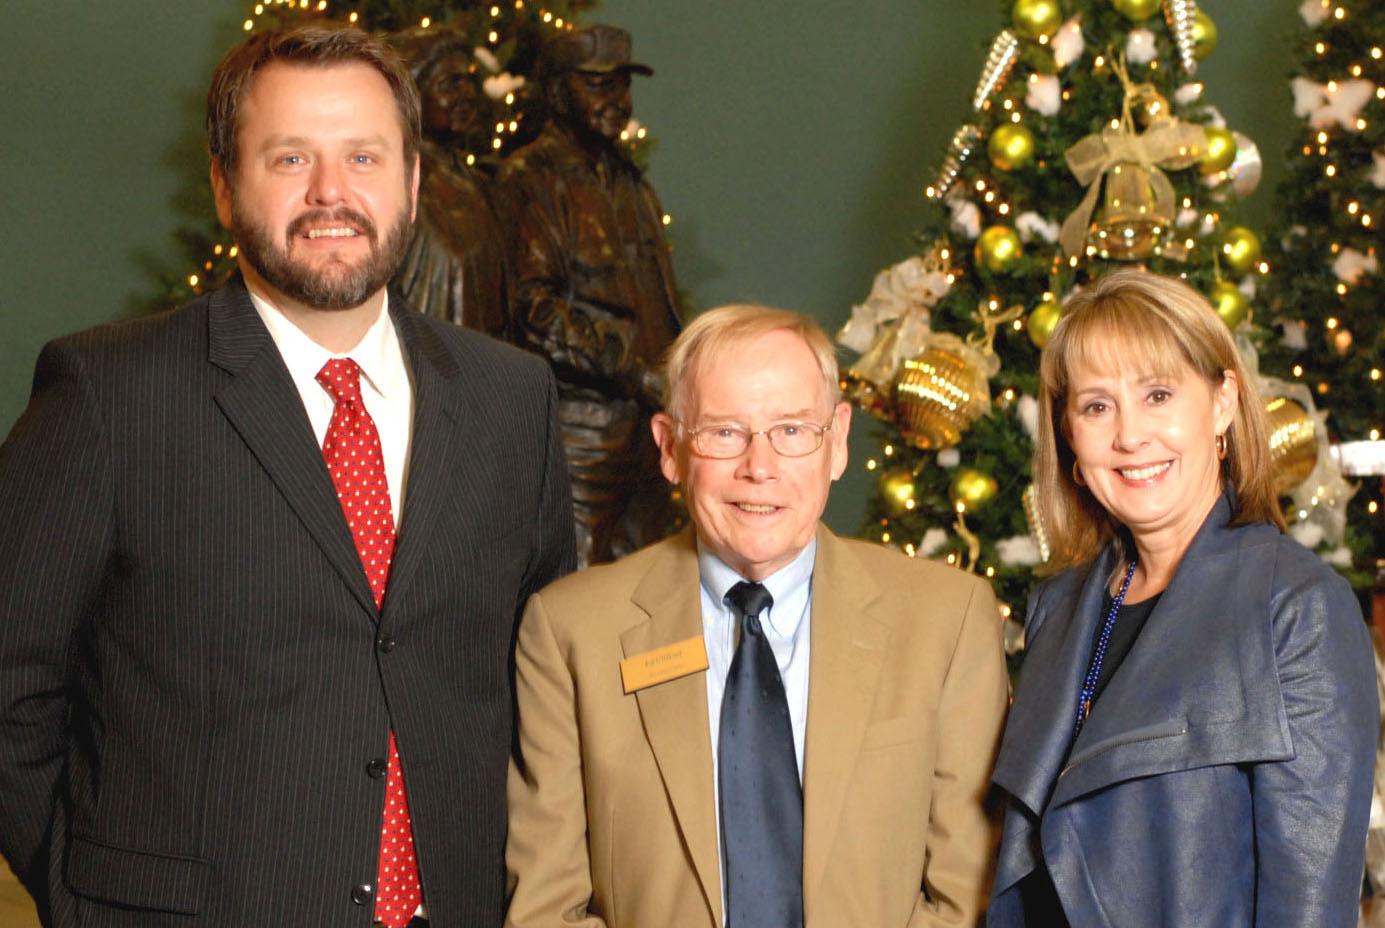 (Left to Right)   Ryan Hale   ,     Program Officer,  Walton Family Foundation;    Ed Clifford  ,   CEO,  Jones Trust;   Anita Scism  ,   President/CEO,  Endeavor Foundation